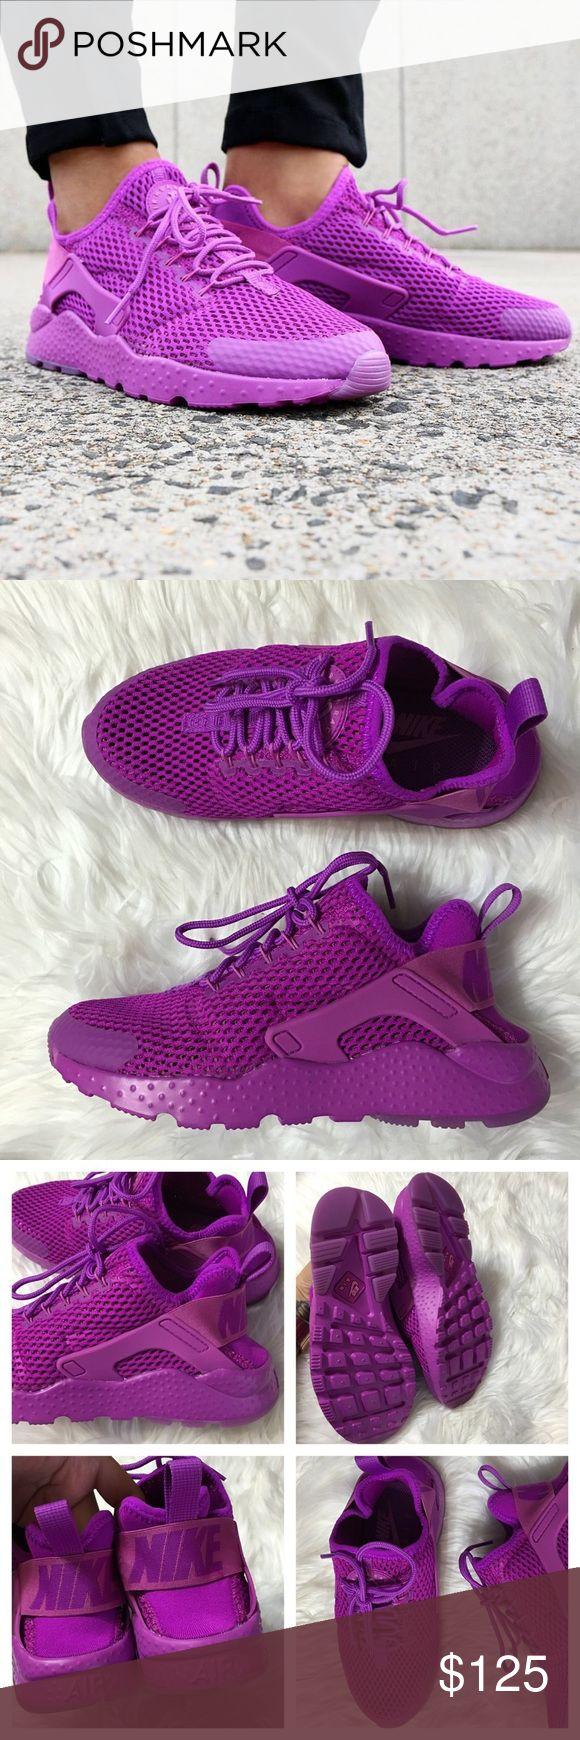 Women's Nike Air Huarache Run Ultra Breathe Brand new with the box but no  lid.